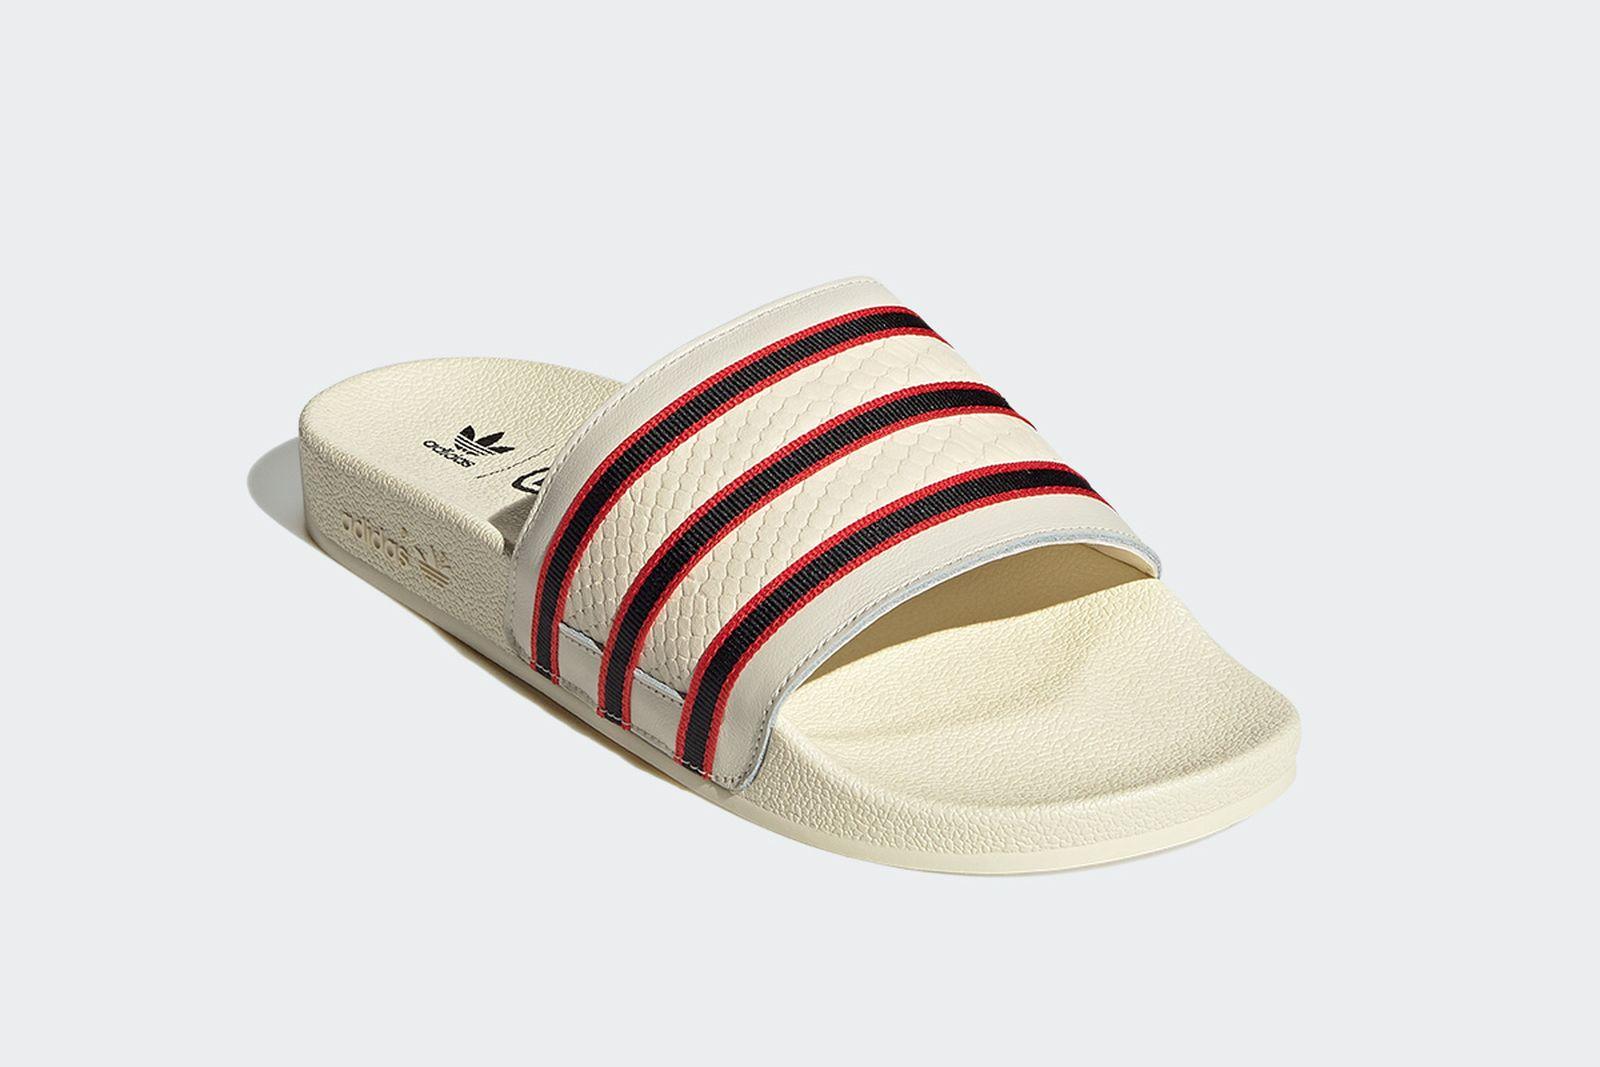 epsn-adidas-top-ten-hi-release-info-06